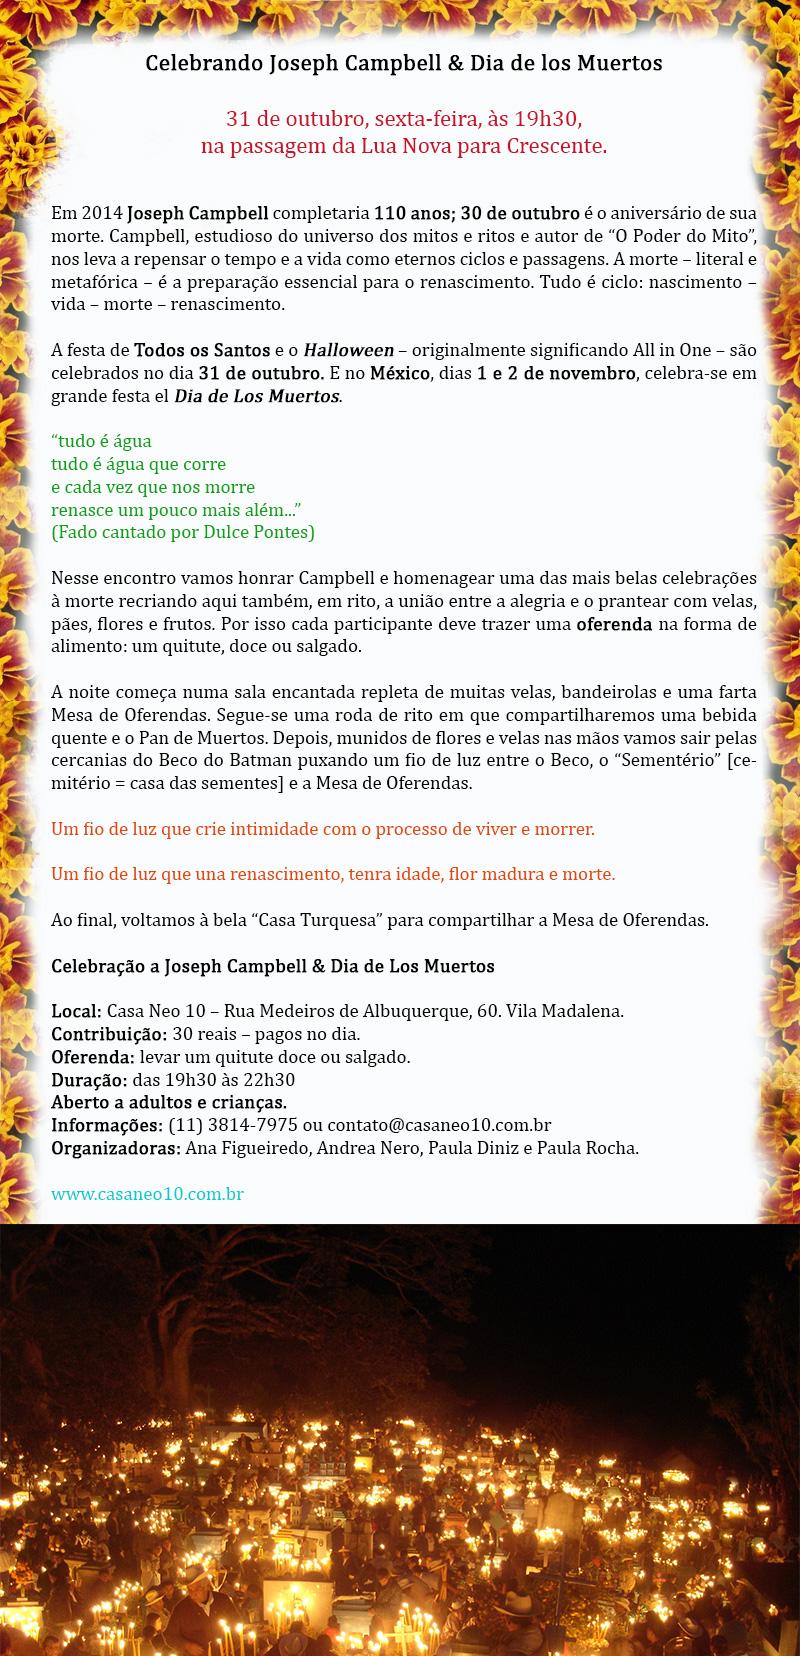 Celebrando Joseph Campbell & Dia de los Muertos